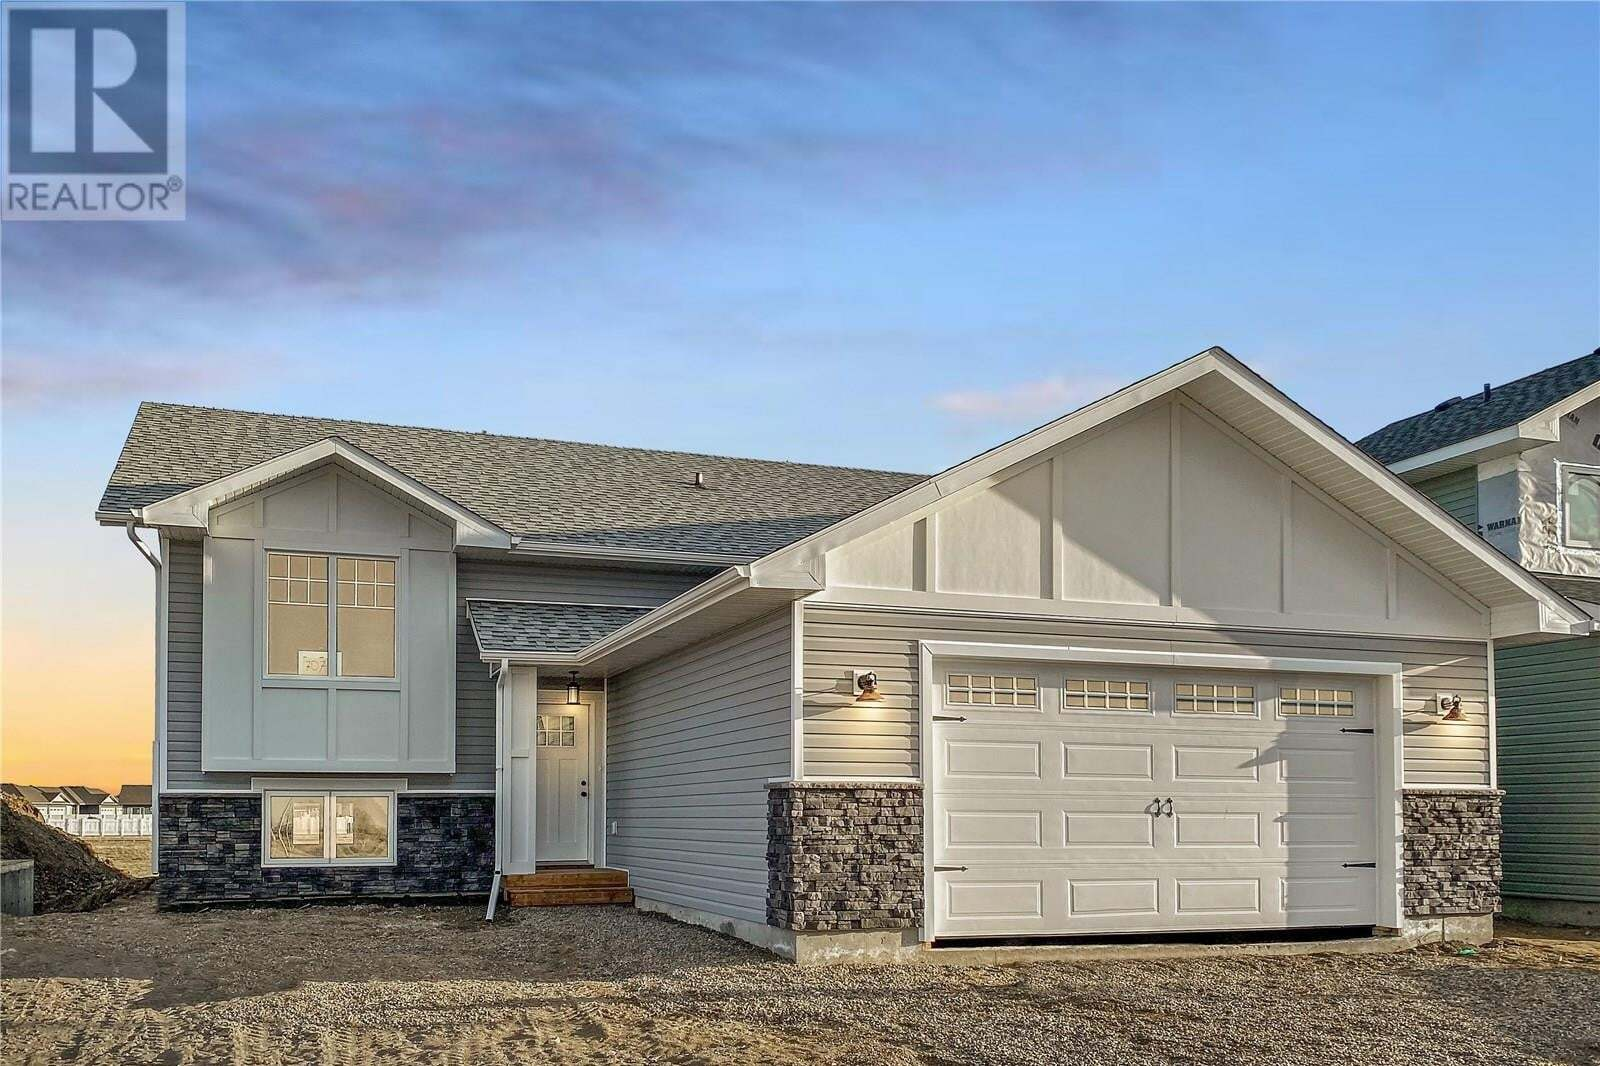 House for sale at 707 Scott Cres Warman Saskatchewan - MLS: SK809428